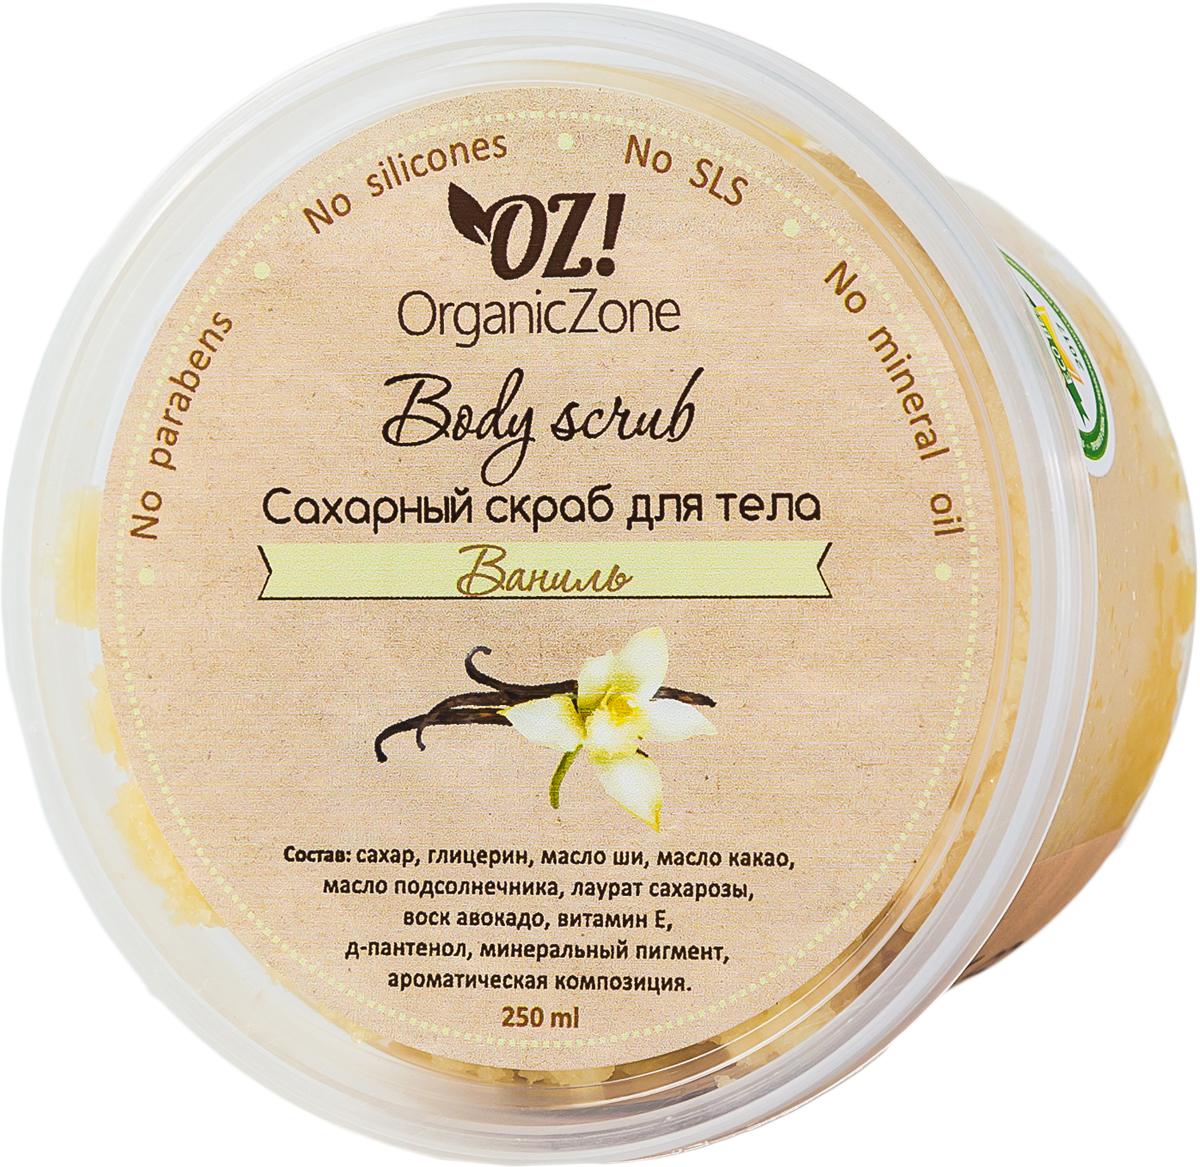 OrganicZone Сахарный скраб для тела Ваниль, 250 мл бальзам для волос oz organiczone oz organiczone oz001lwcowj2